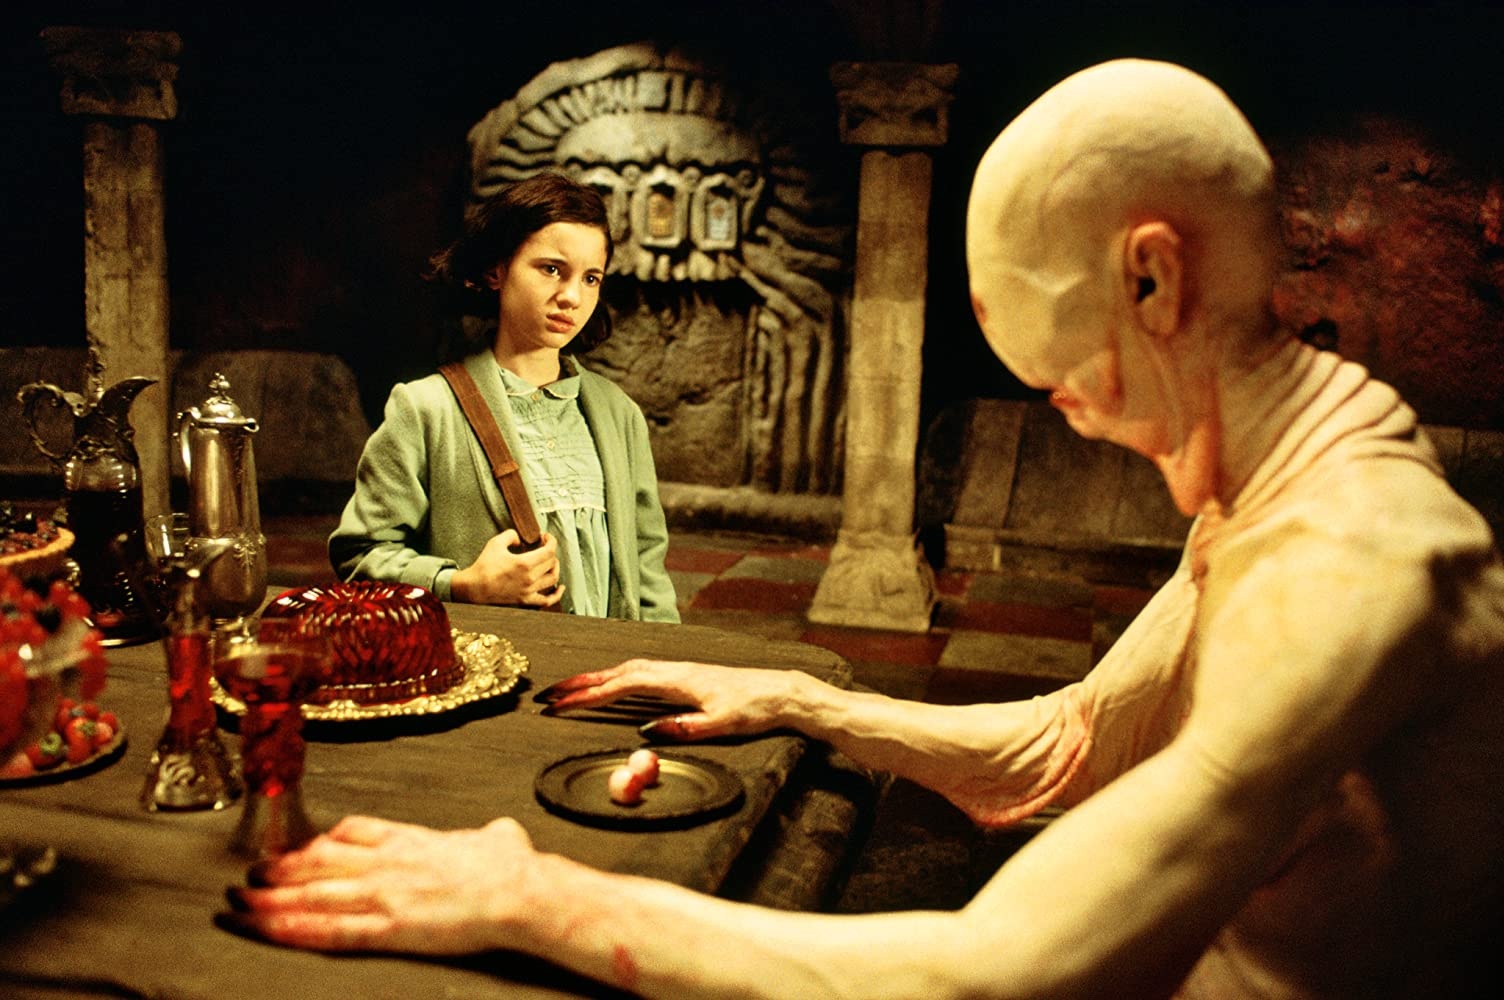 Doug Jones and Ivana Baquero in El laberinto del fauno (2006)